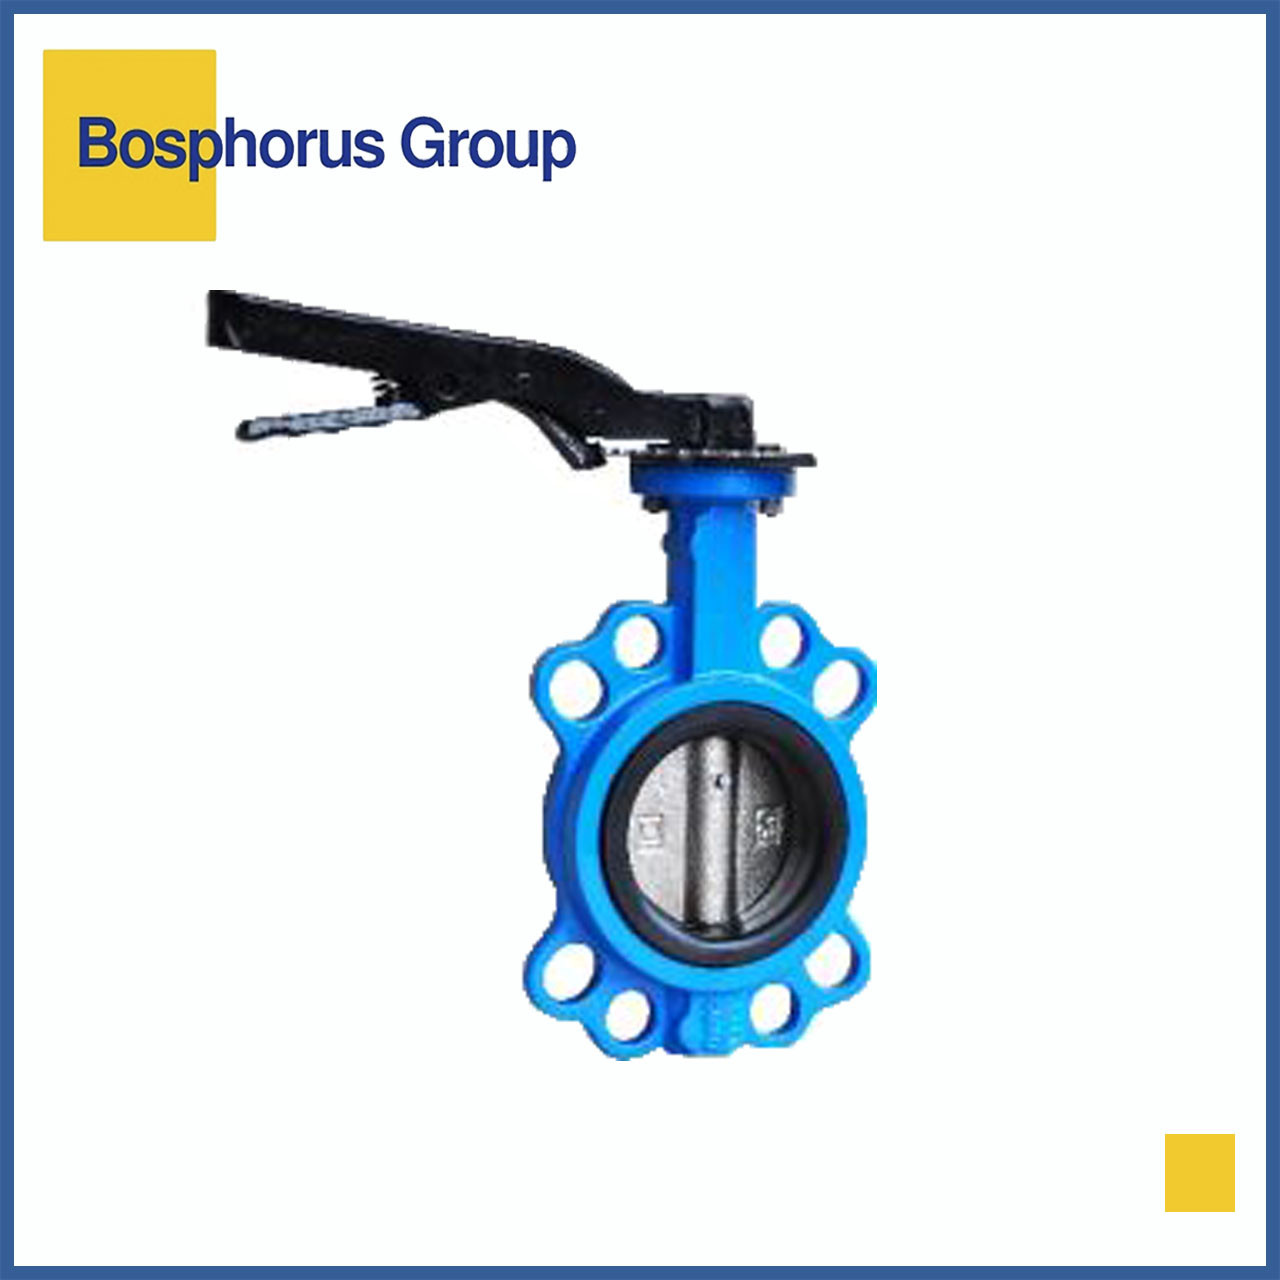 Затвор дисковый межфланцевый Ду250 Ру16, Brandoni (вода, +120)